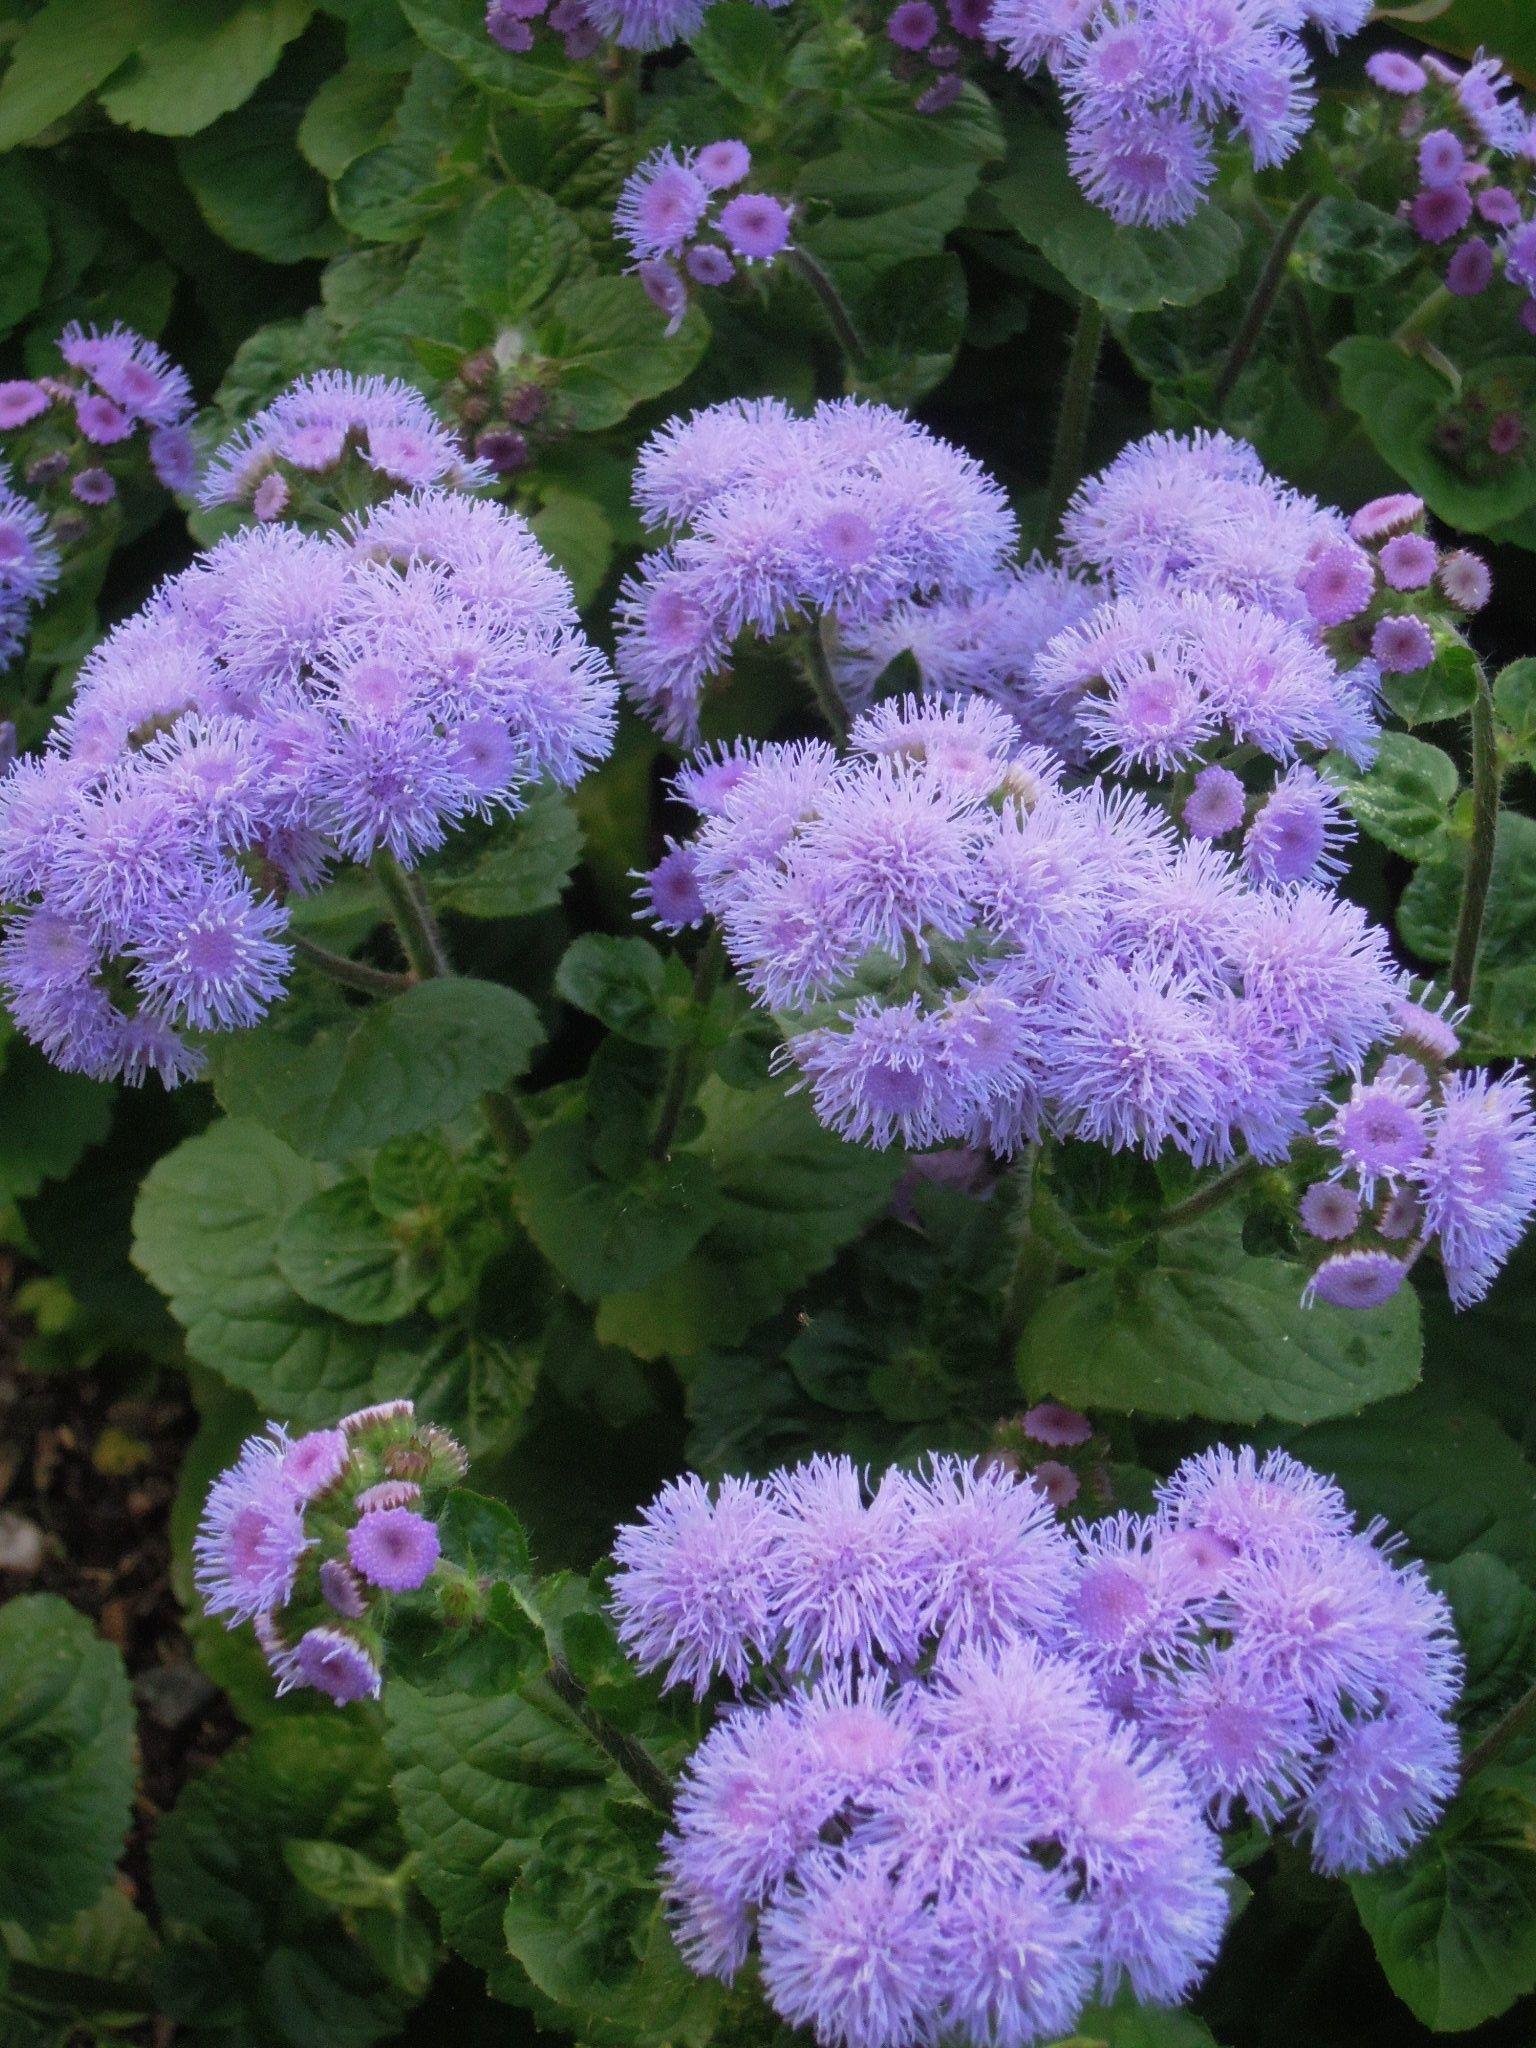 Pasmaslill Ageratum Houstonianum Plants That Attract Butterflies Bloom Amazing Flowers